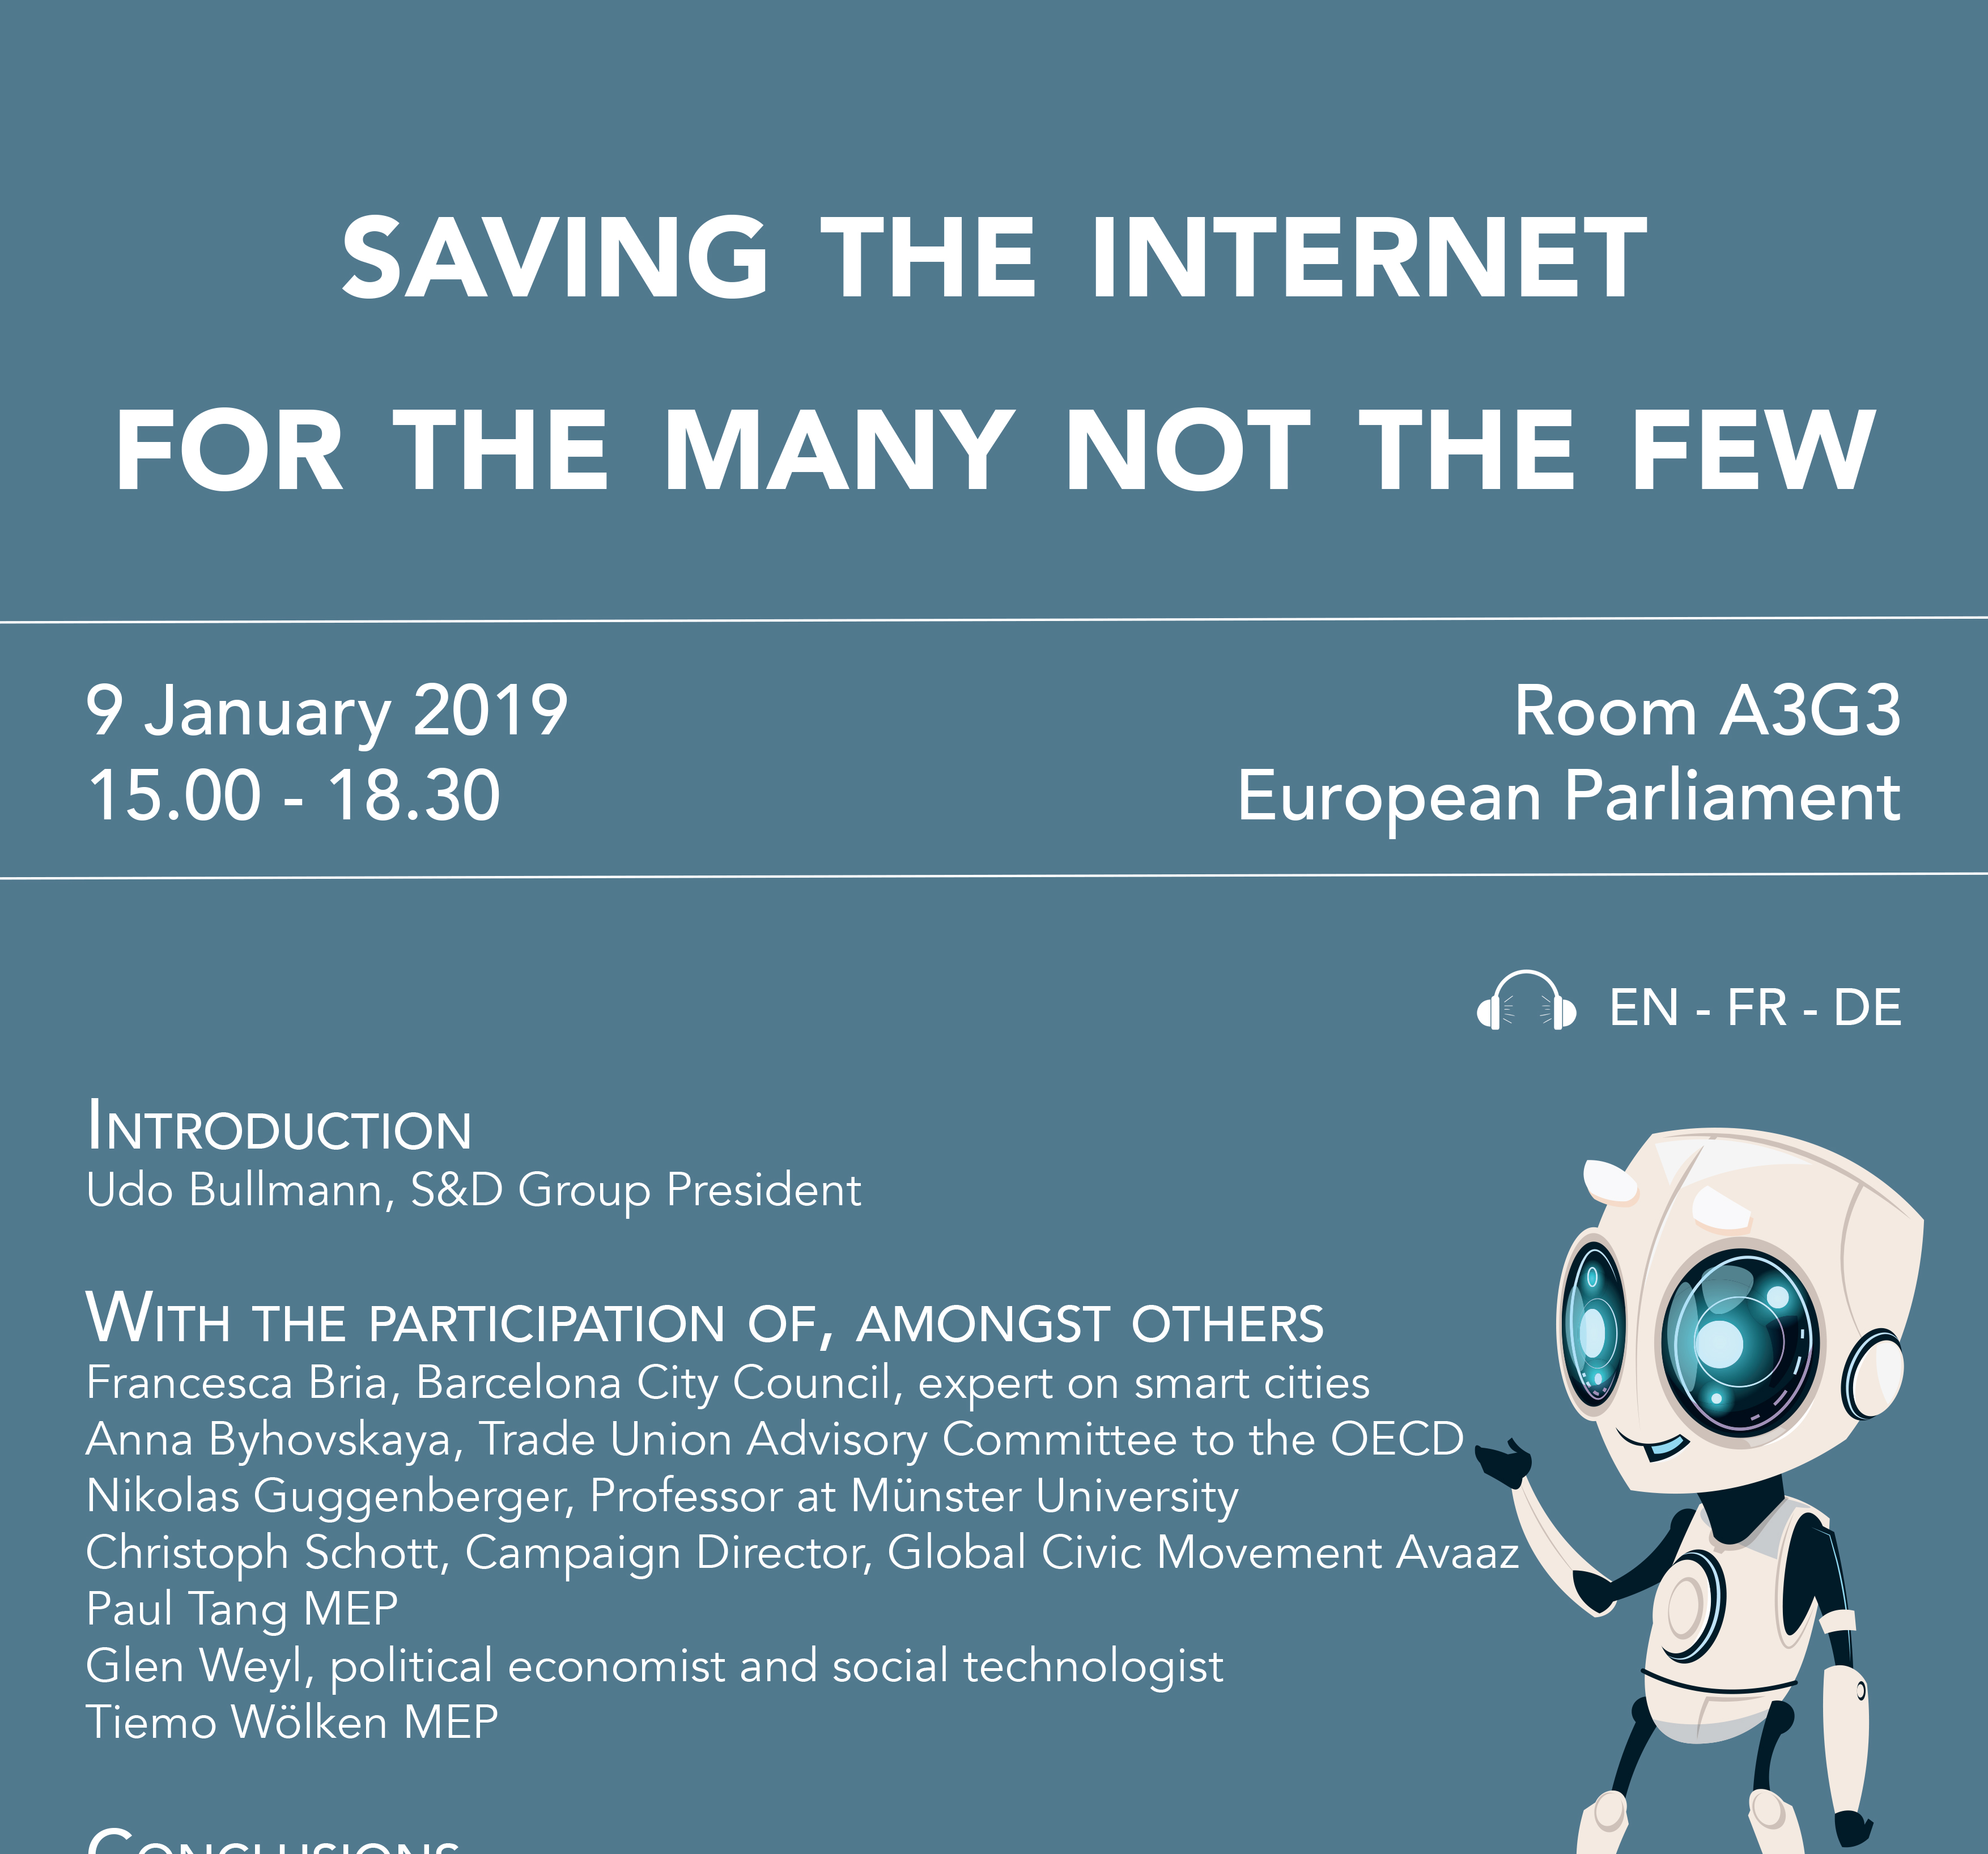 Progressive Society - Saving the Internet for the many not the few